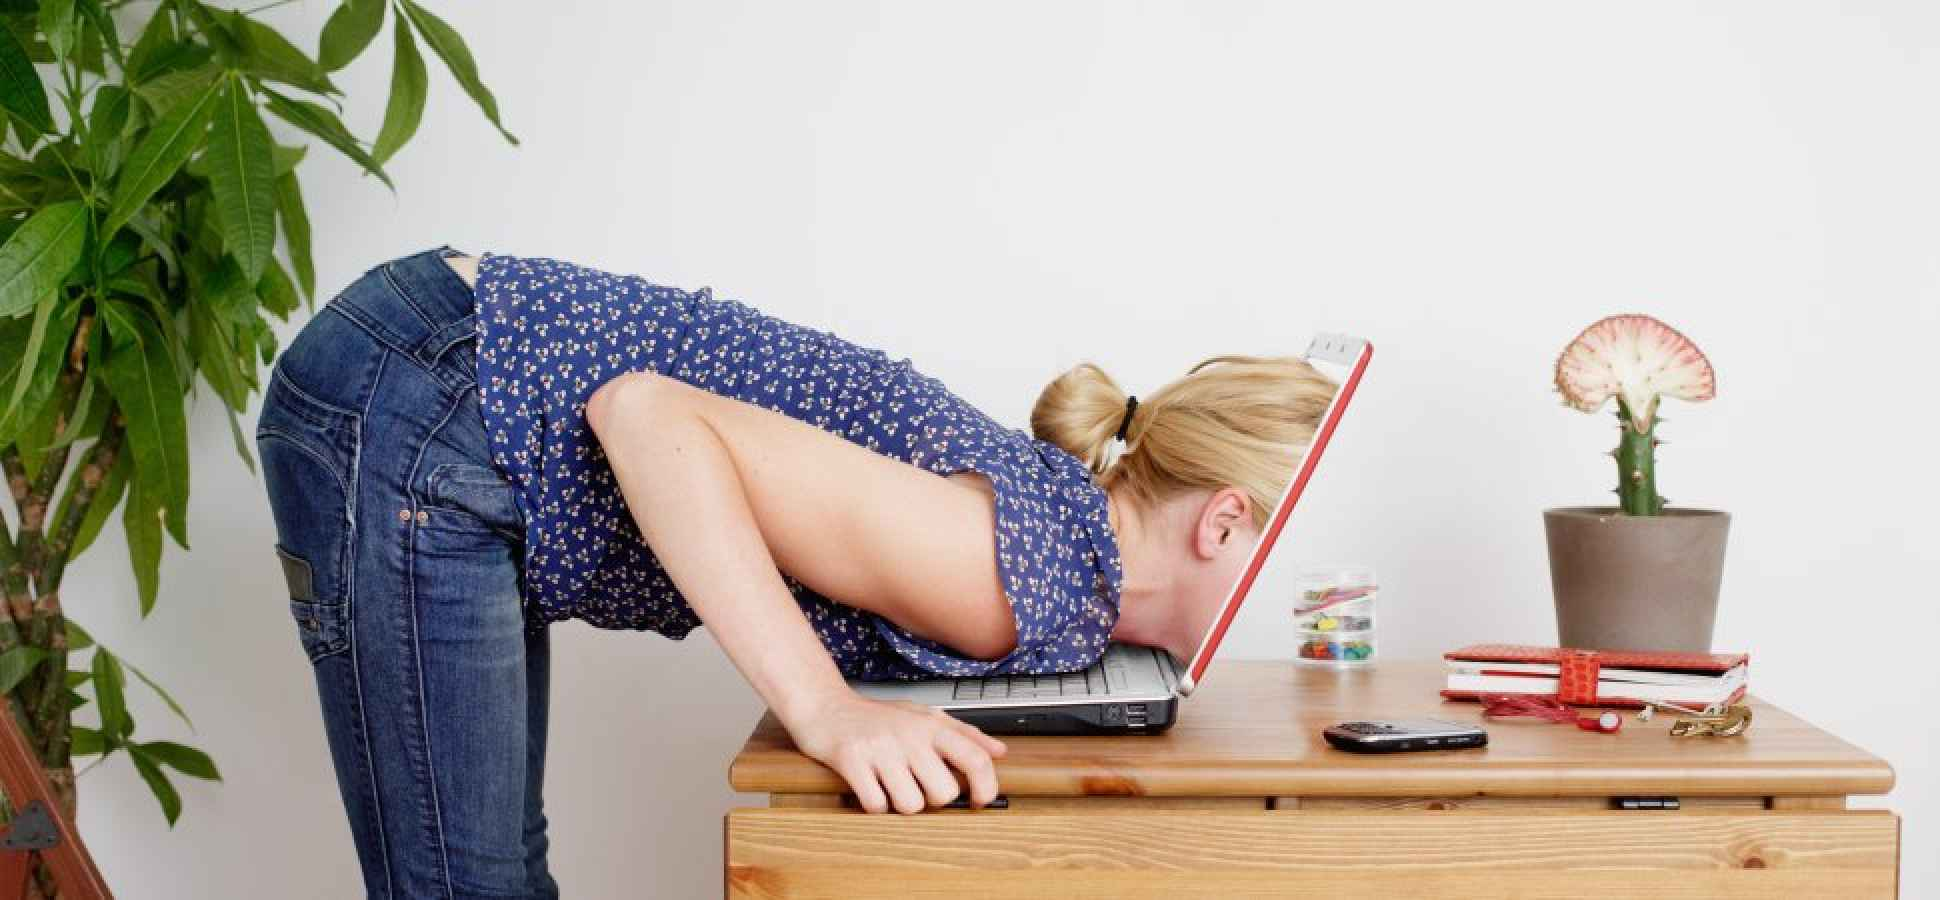 5 Entrepreneurial Bad Habits You Need to Break Pronto